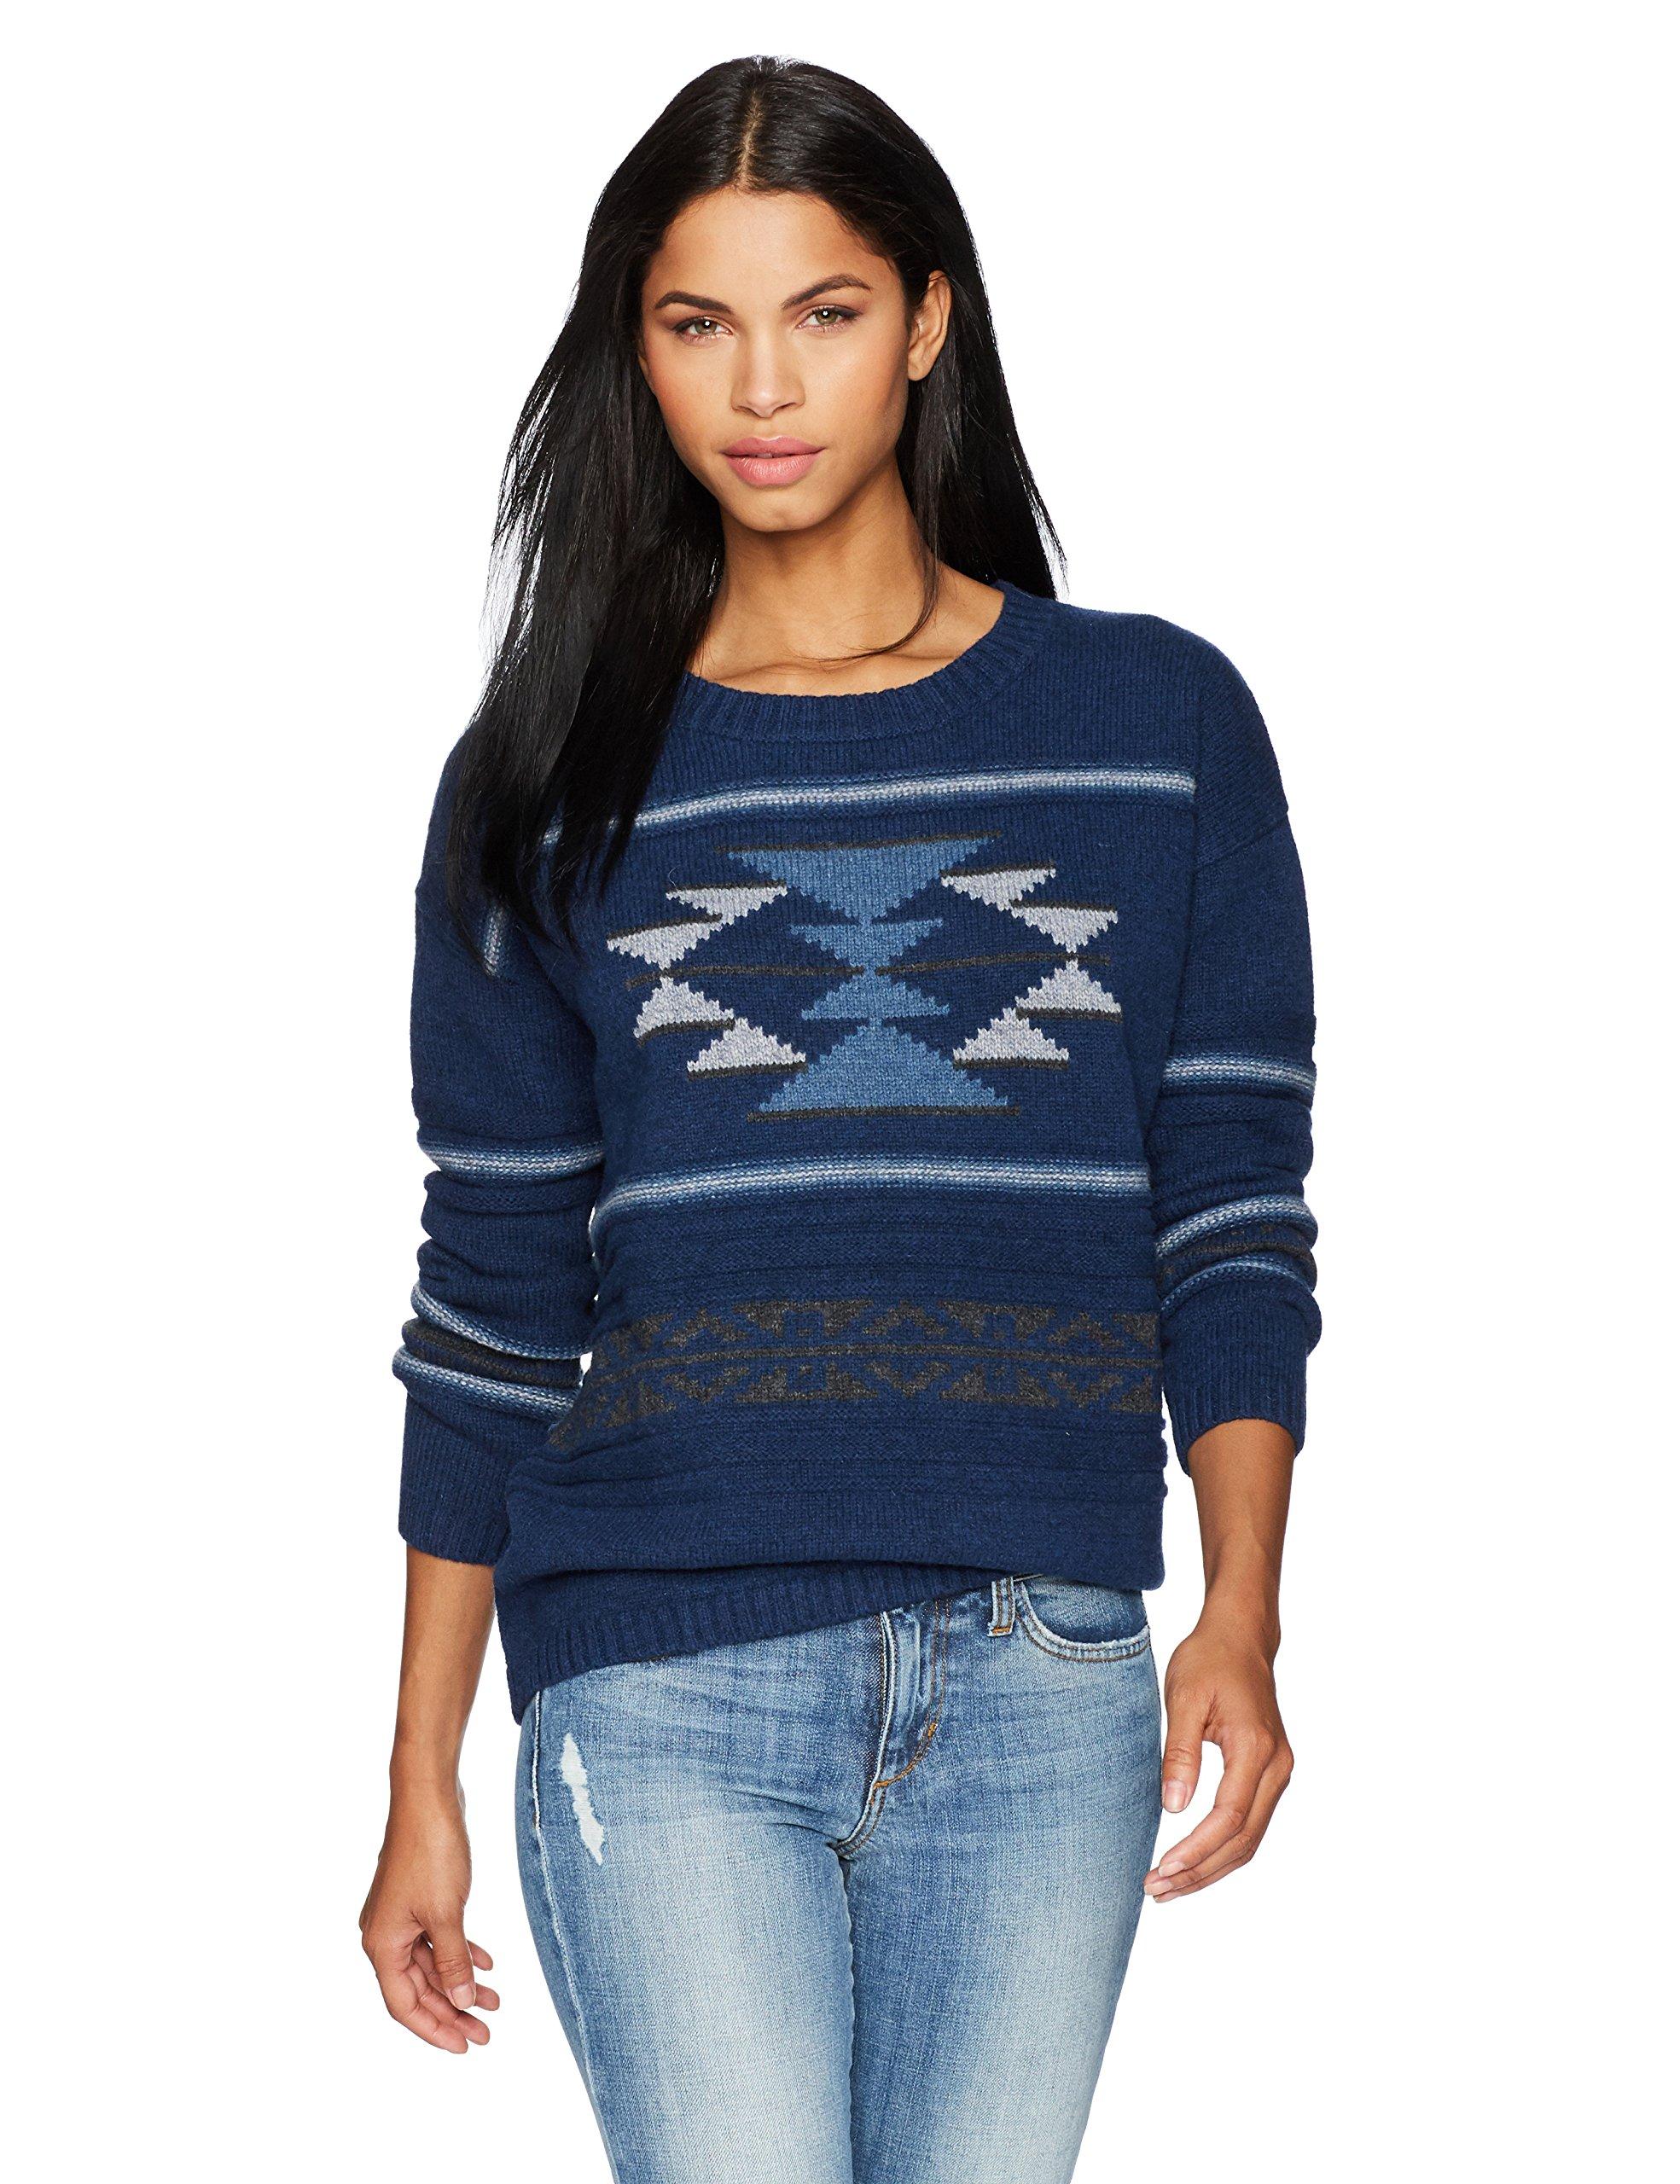 Pendleton Women's Graphic Crew Neck Lambswool Pullover Sweater, Navy Multi, SM